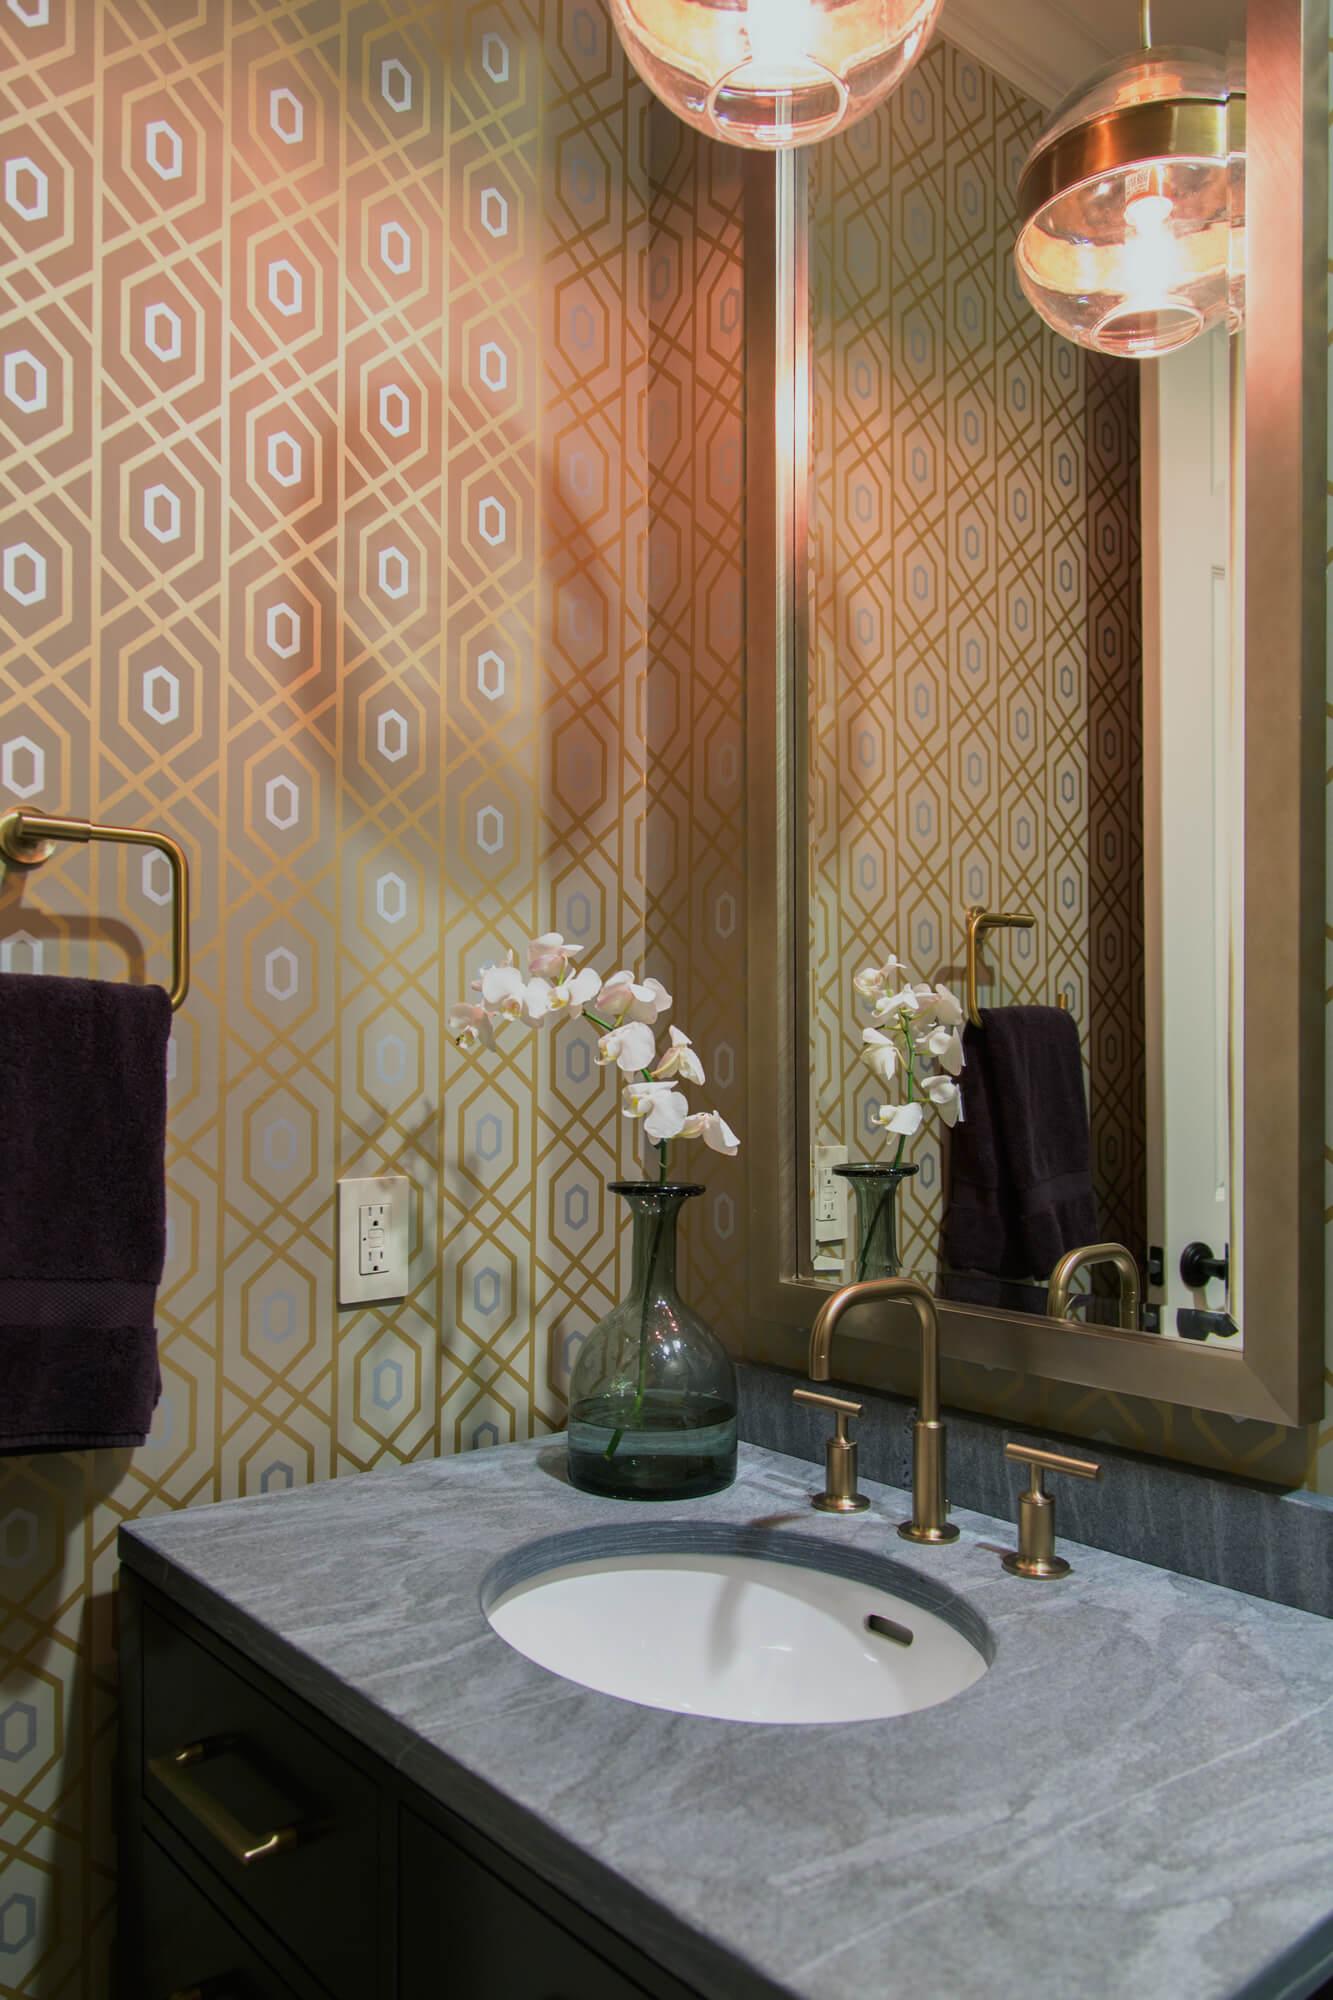 A powder bath with pendant lighting above the mirror is a unique way to illuminate the bathroom. Carla Aston, Designer | Tori Aston, Photographer | #pendantlighting #bathroomlights #vanitylight